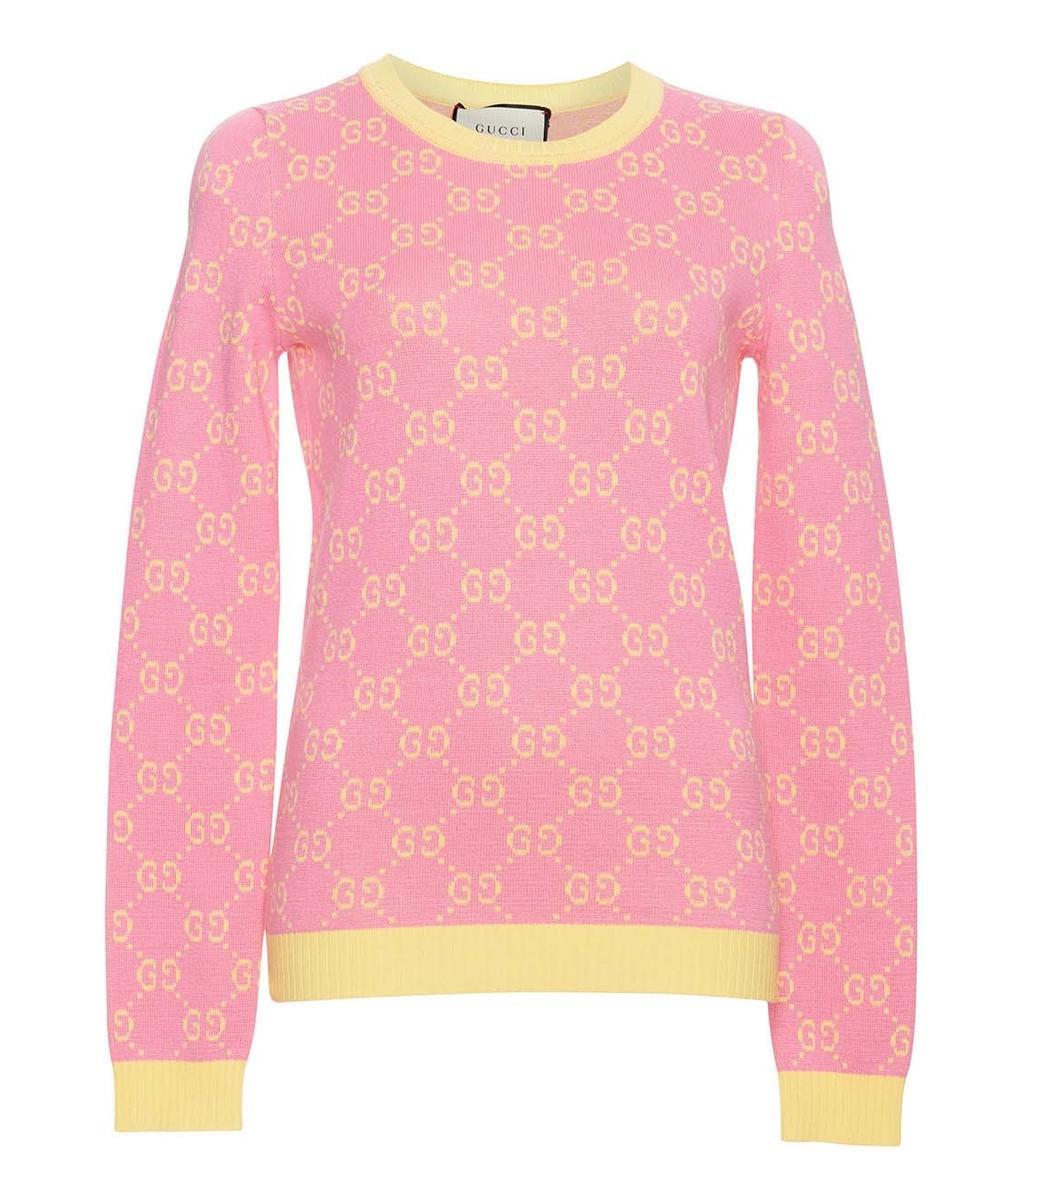 16f829402675a Gucci Yellow Pink Long Sleeve Crewneck Sweater